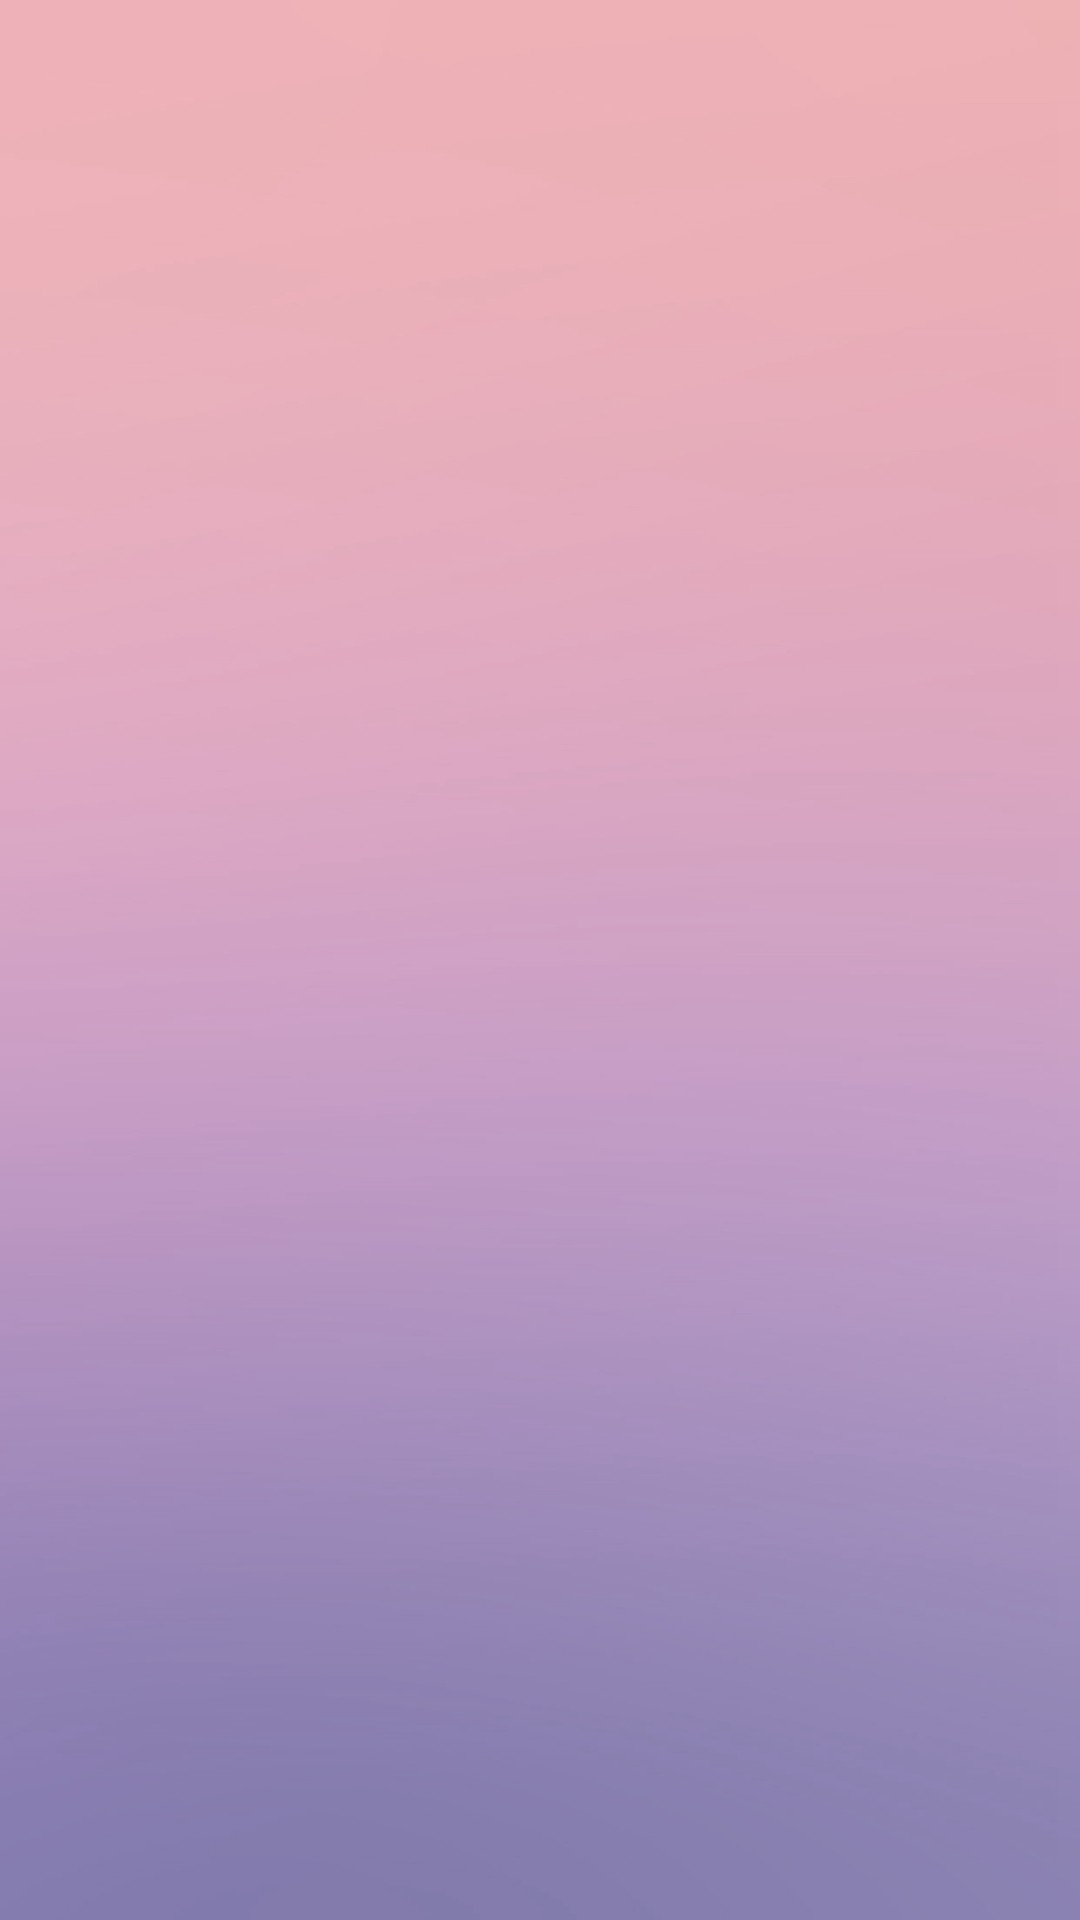 Pink Blue Purple Harmony Gradation Blur iPhone 6 wallpaper